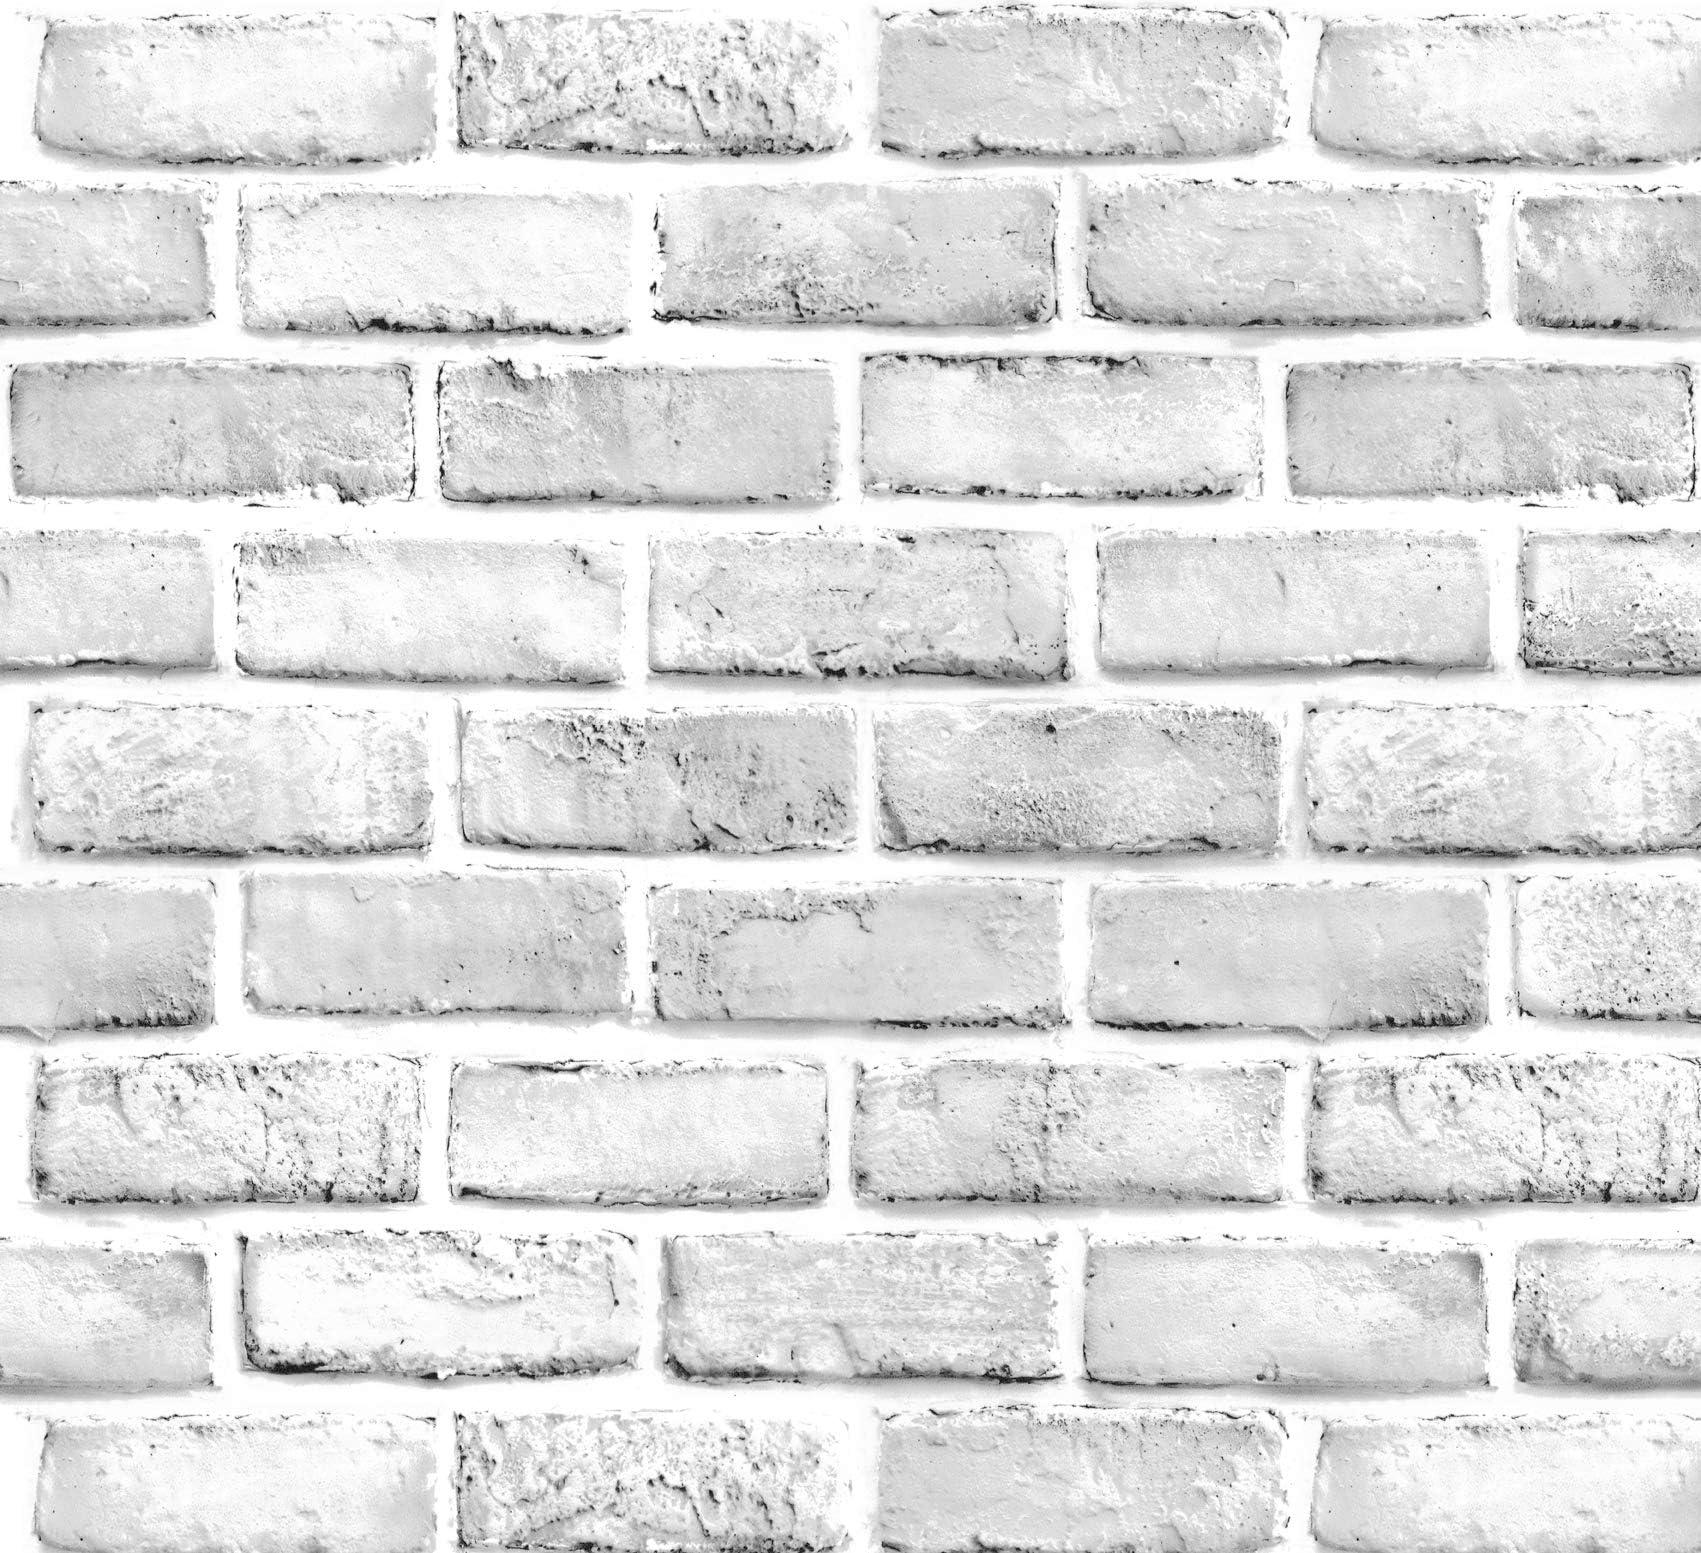 White Brick Wallpaper Peel And Stick Wallpaper Self Adhesive Wallpaper Easily Removable Wallpaper 3d Wallpaper Use As Wall Paper Backsplash Peel Stick Or Shelf Paper 23 6 X 393